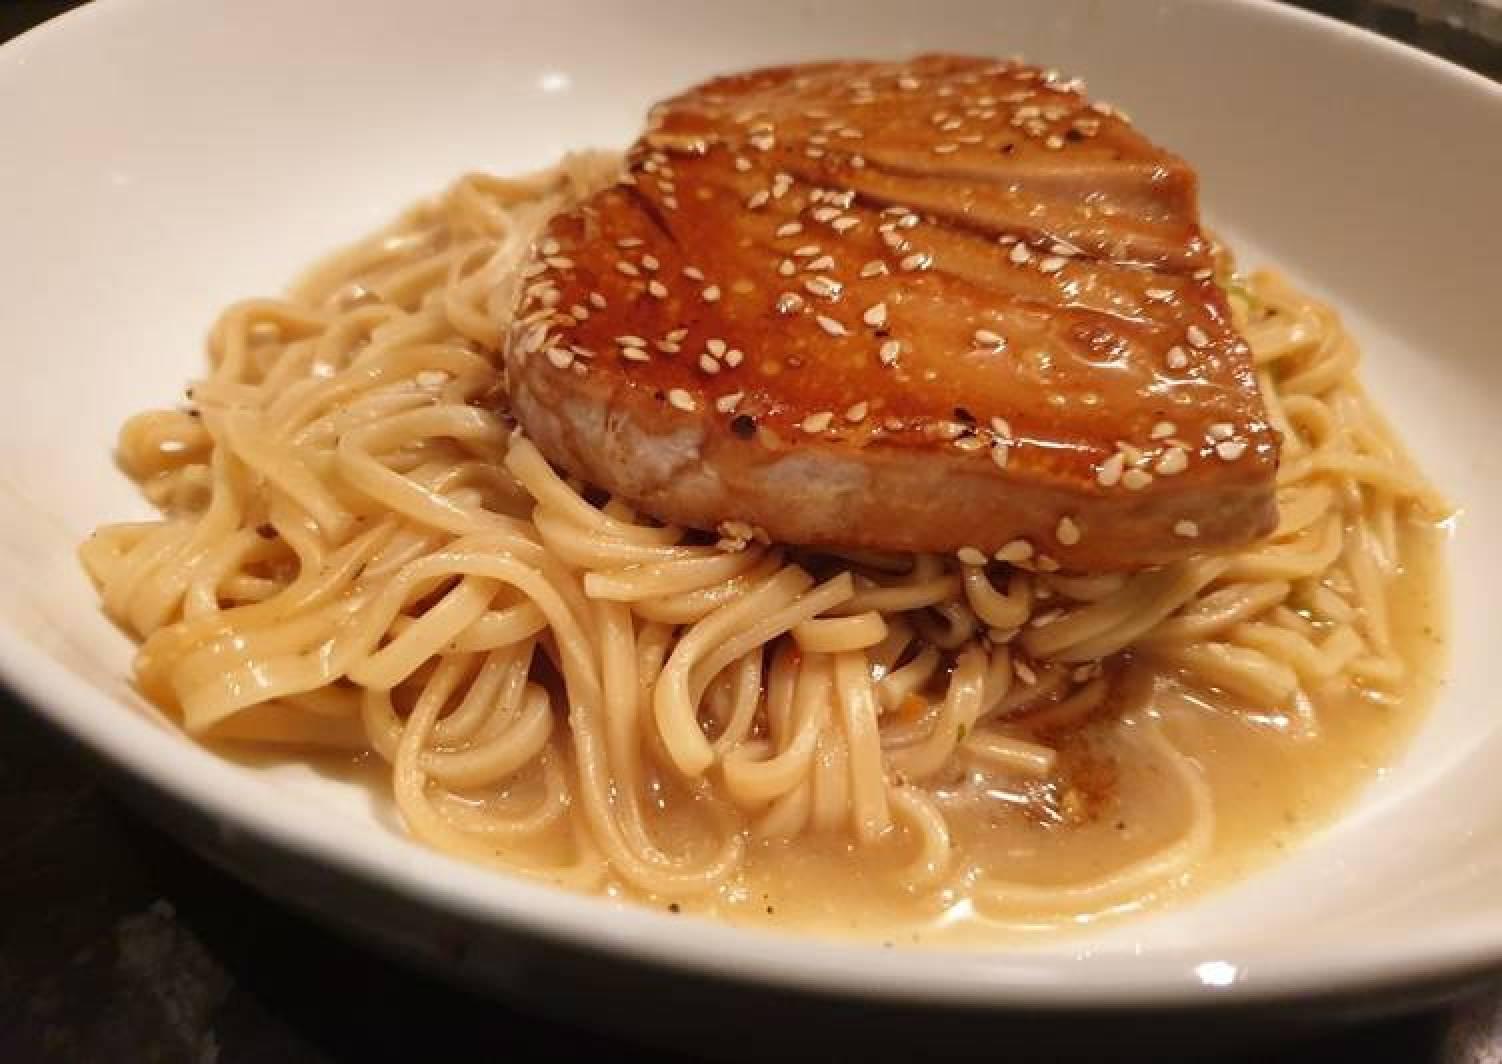 Teriyaki tuna noodles